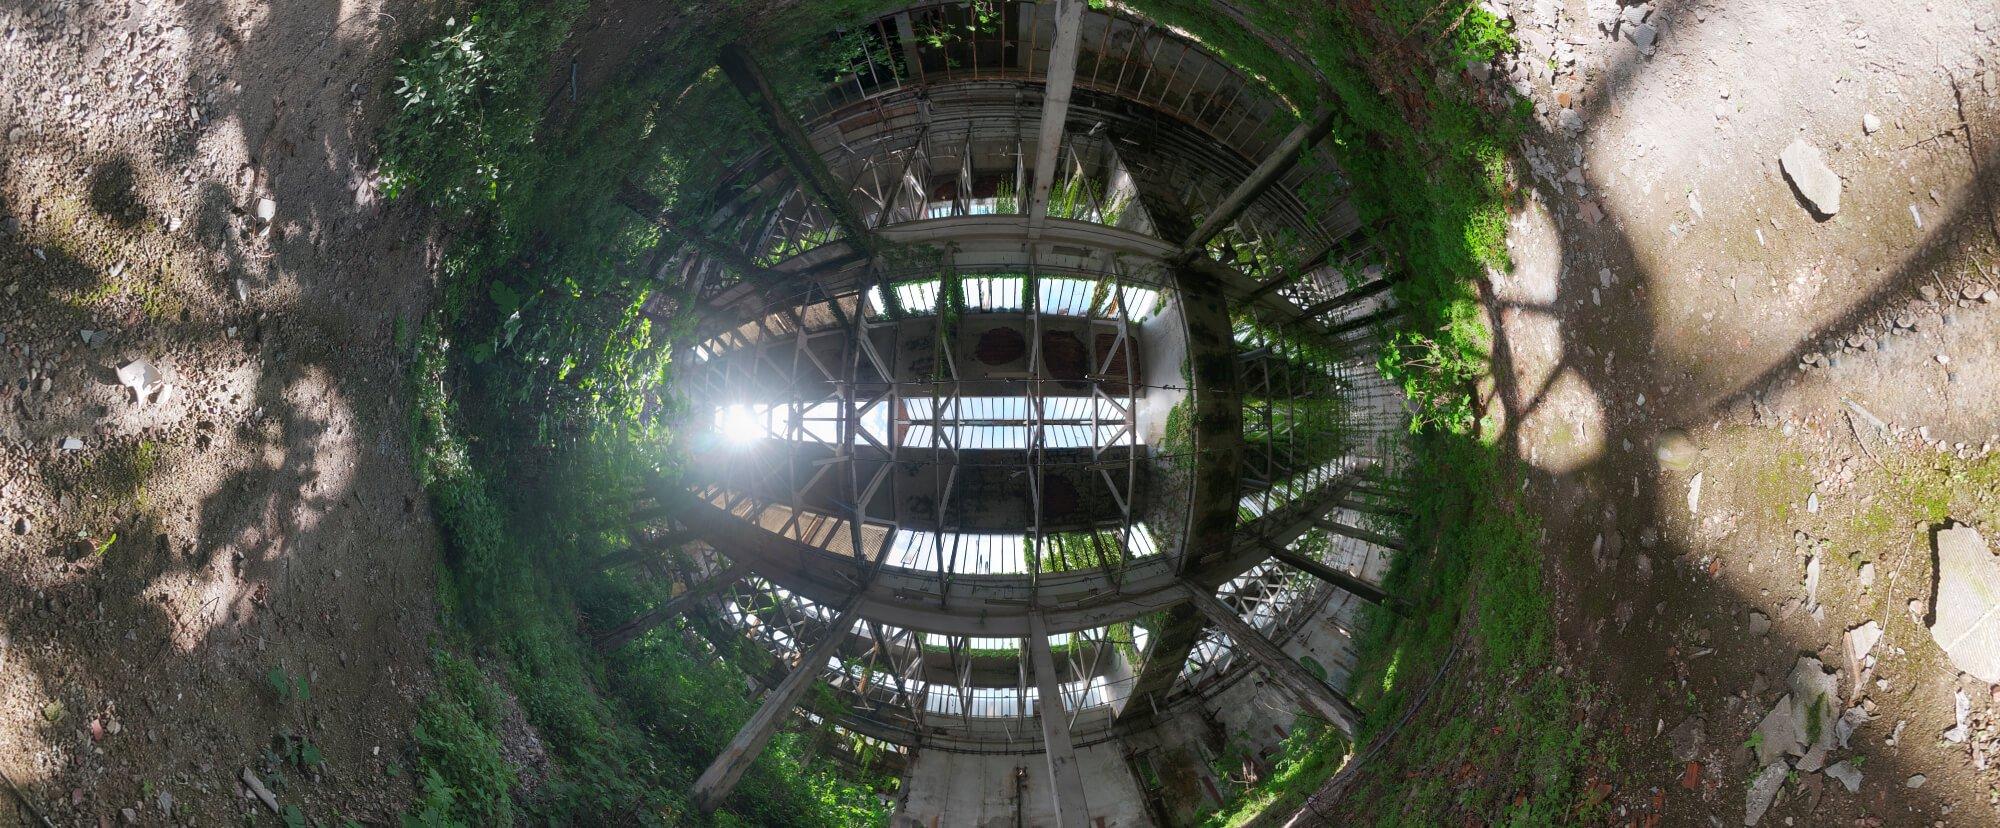 virtual tour urbex exploration warehouse